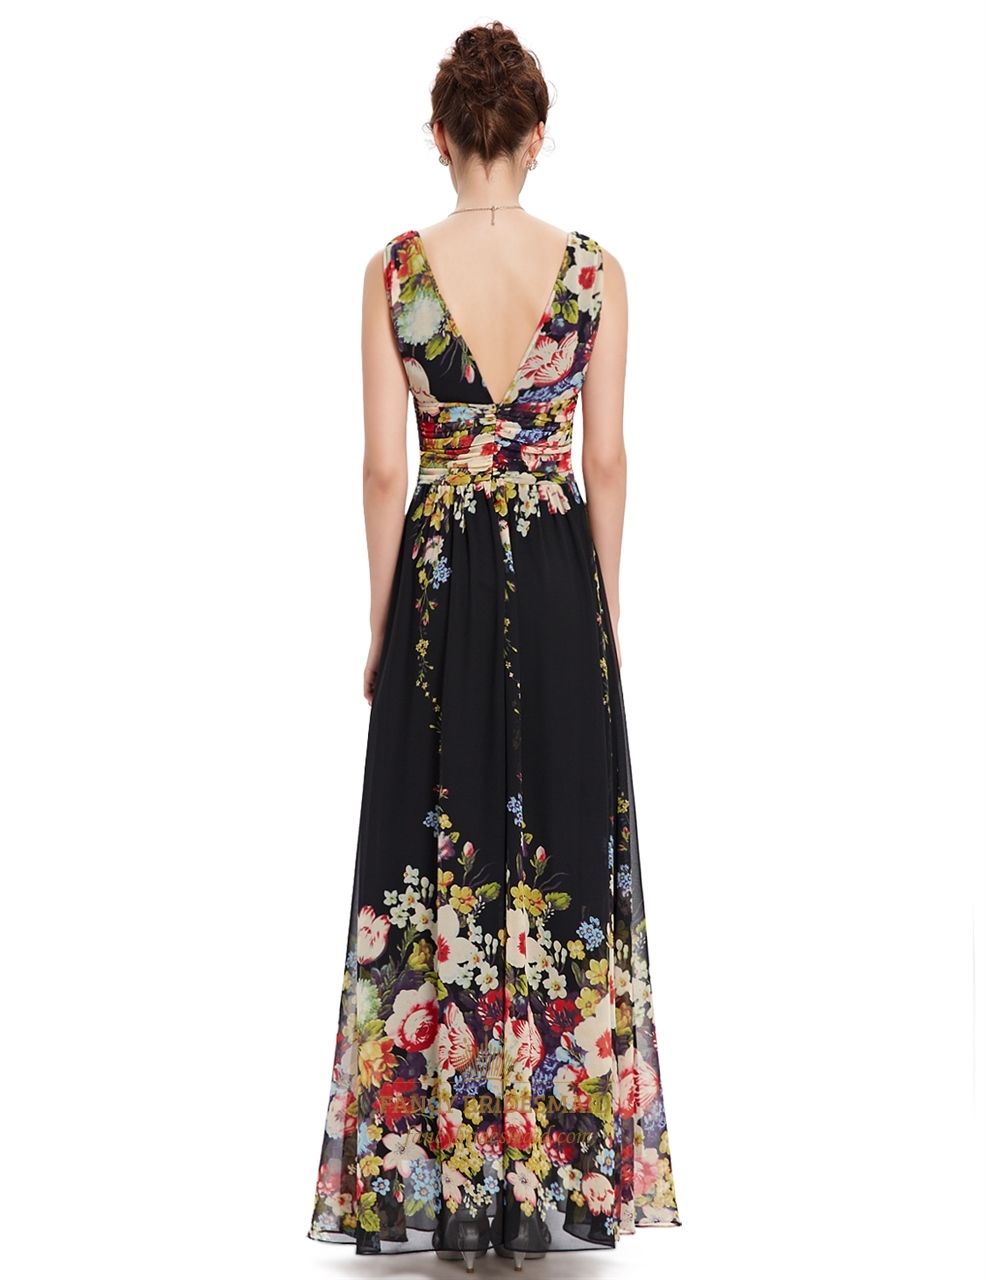 Black Deep V Neck Floral Print Long Chiffon Prom Dresses